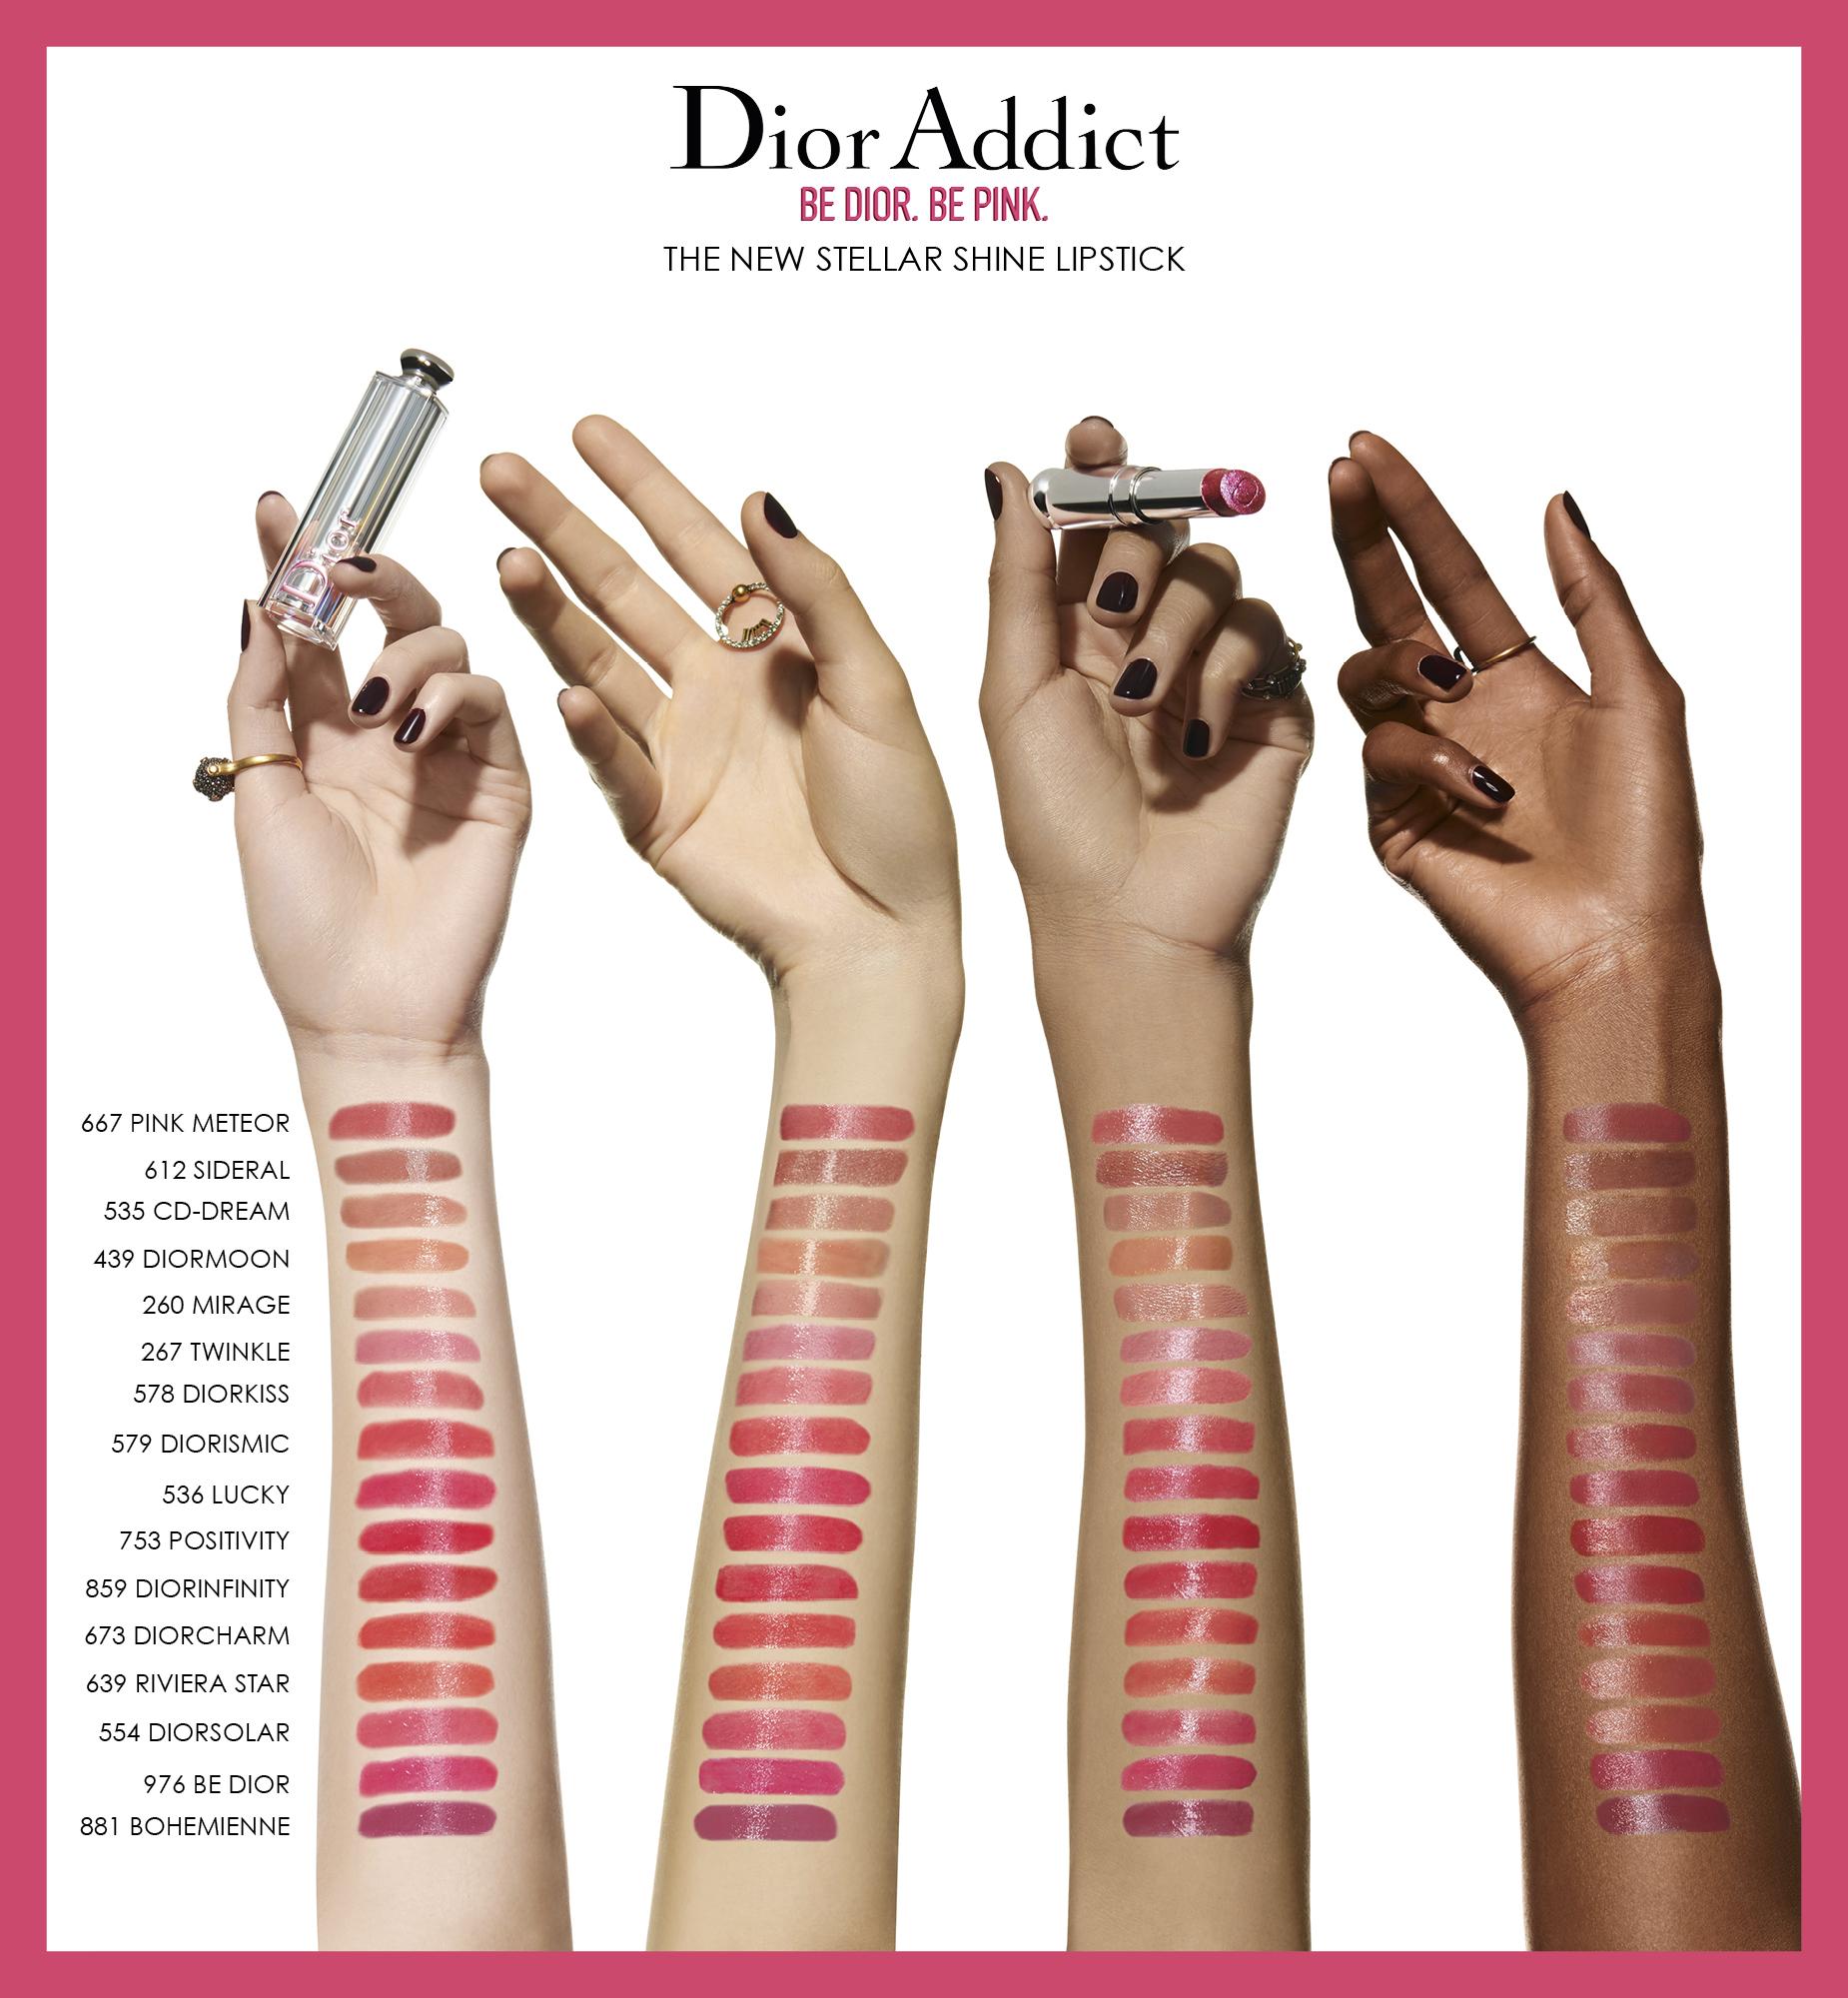 DIOR Addict Stellar Shine, 976 Be Dior